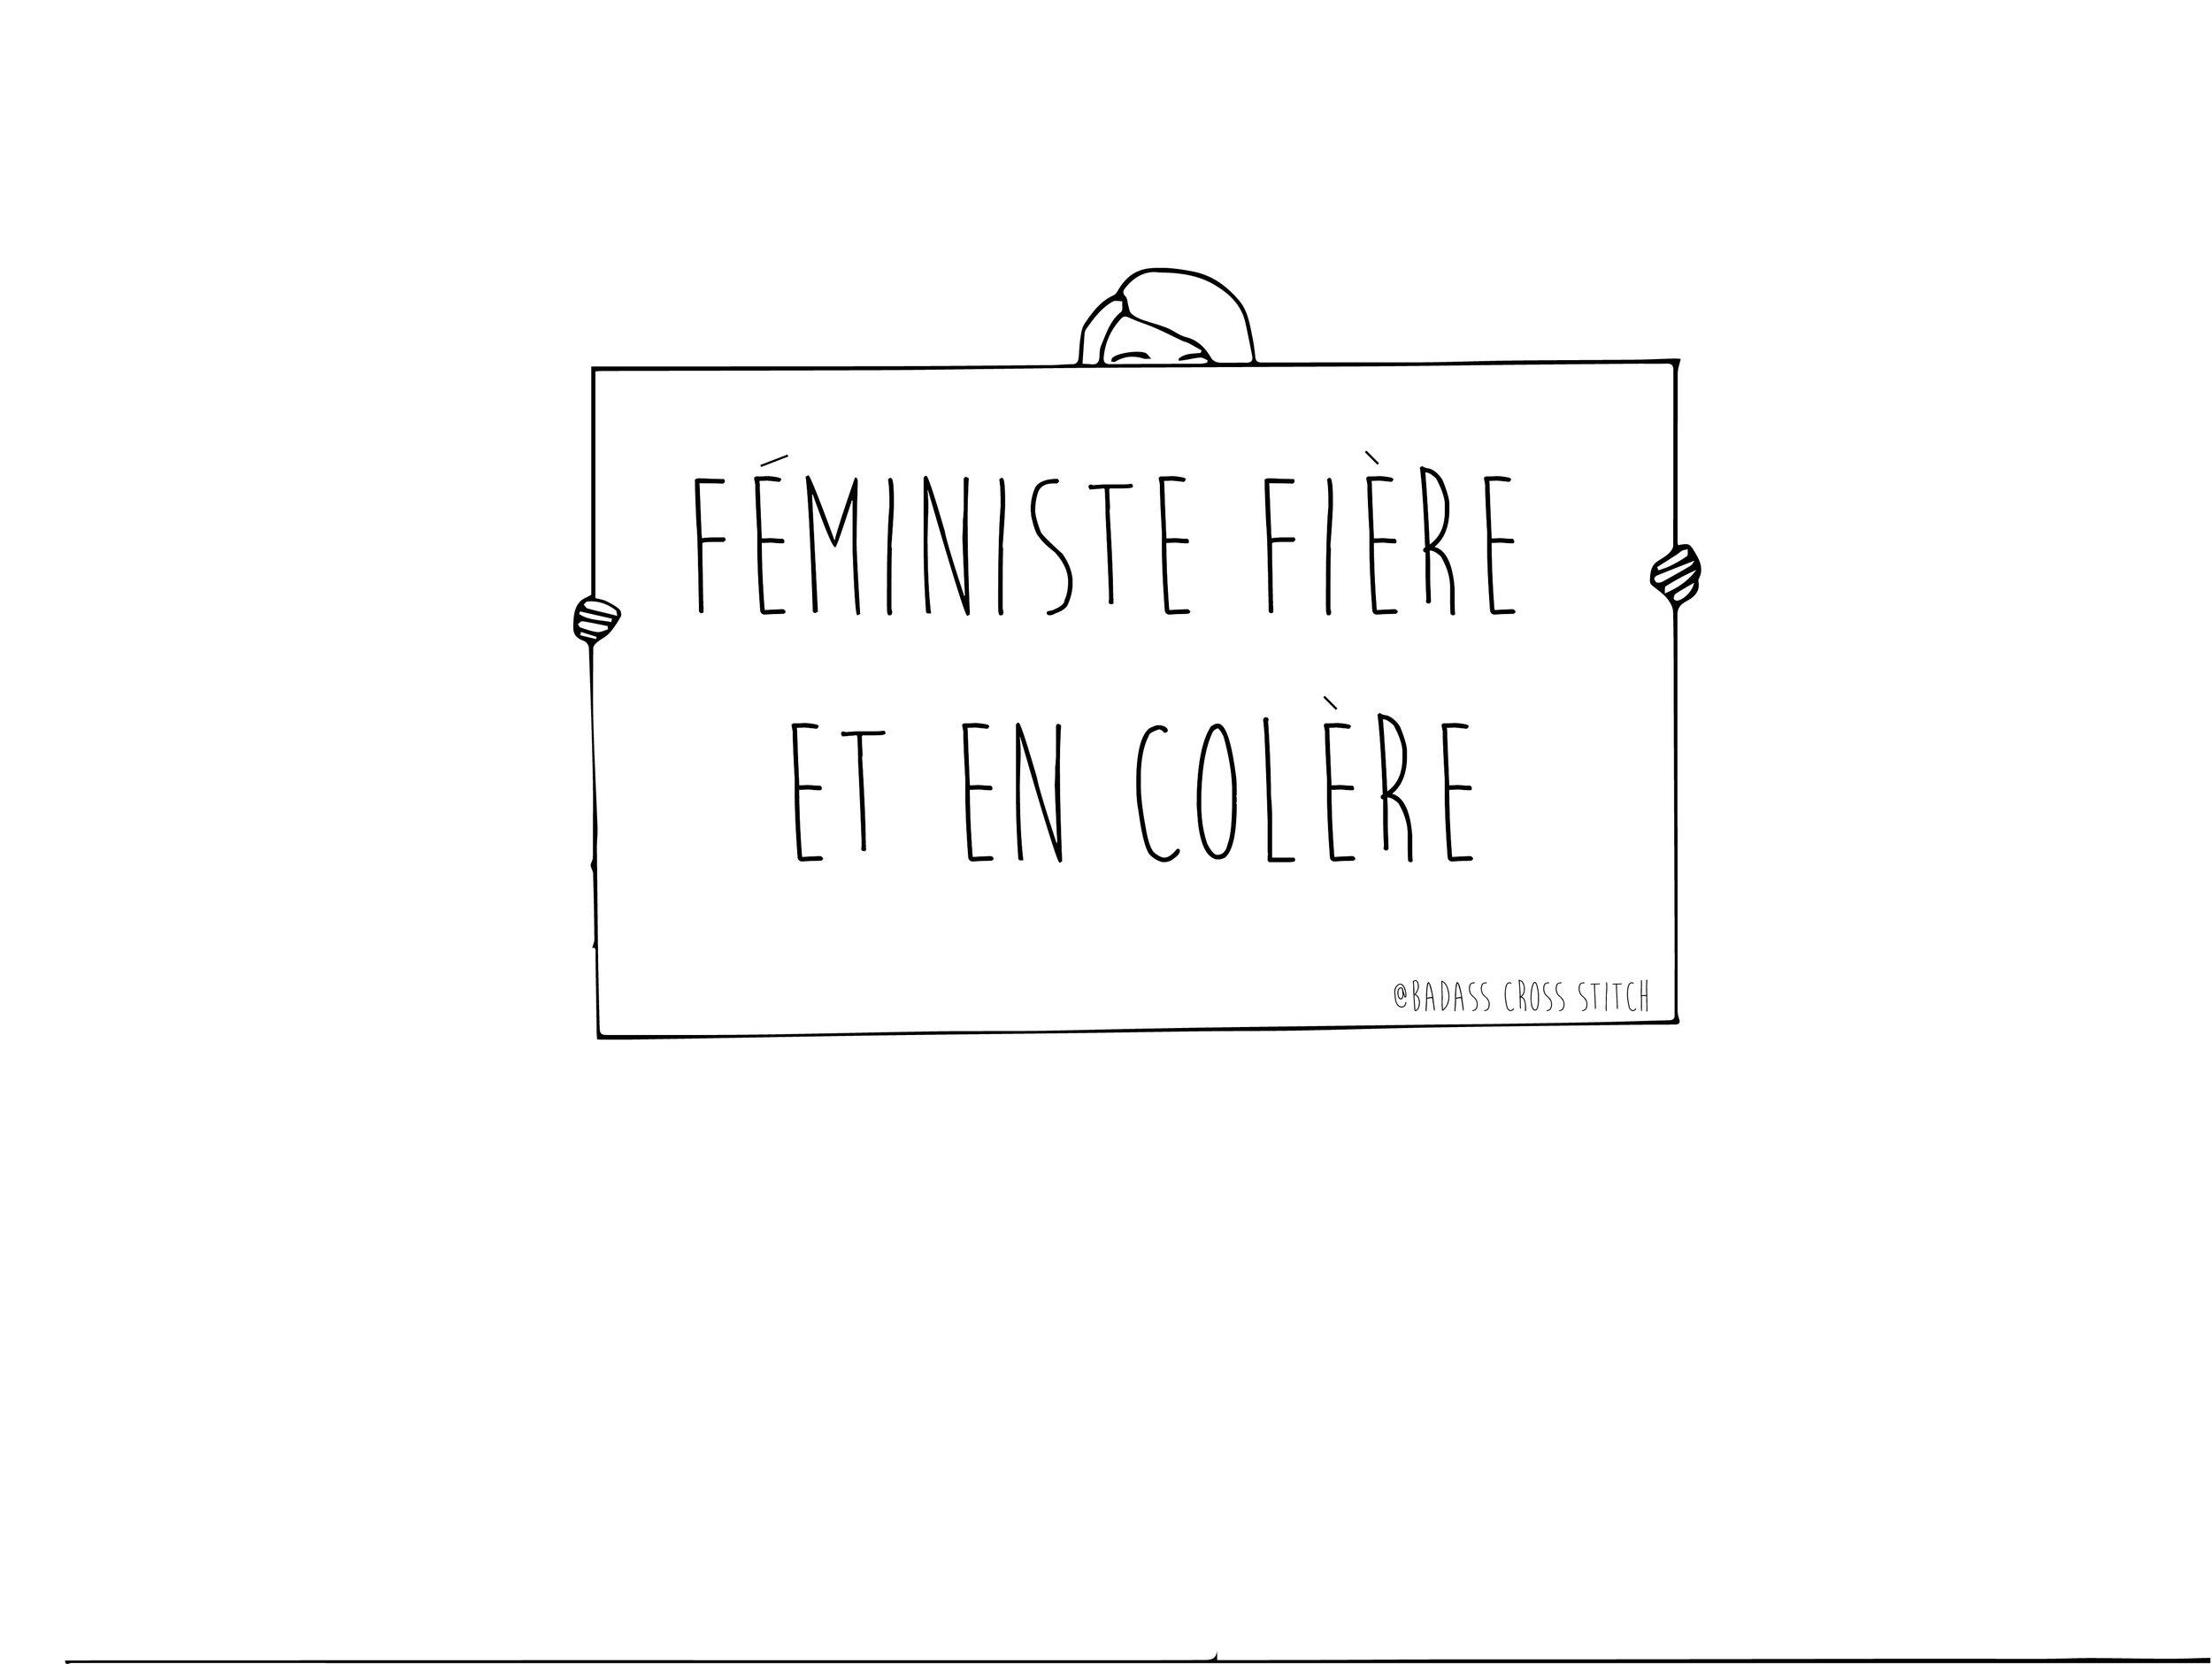 TinyShannon-feministFrench.jpg